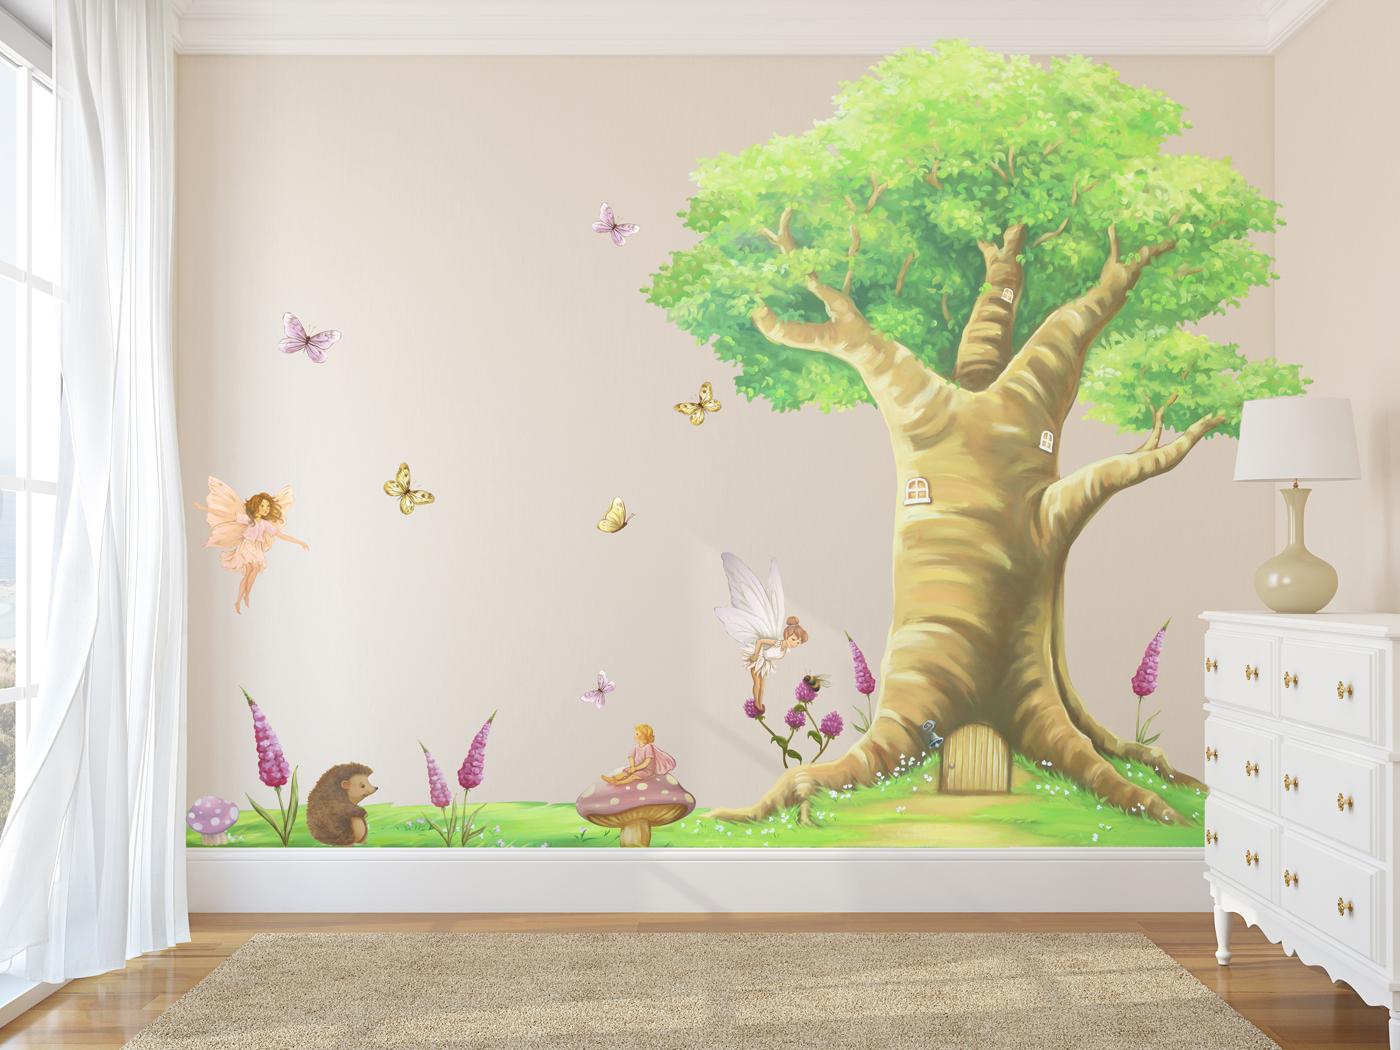 Mural Wallpaper Kids Girls Full Wall Magical Fairy Tree Set Wall Stickers